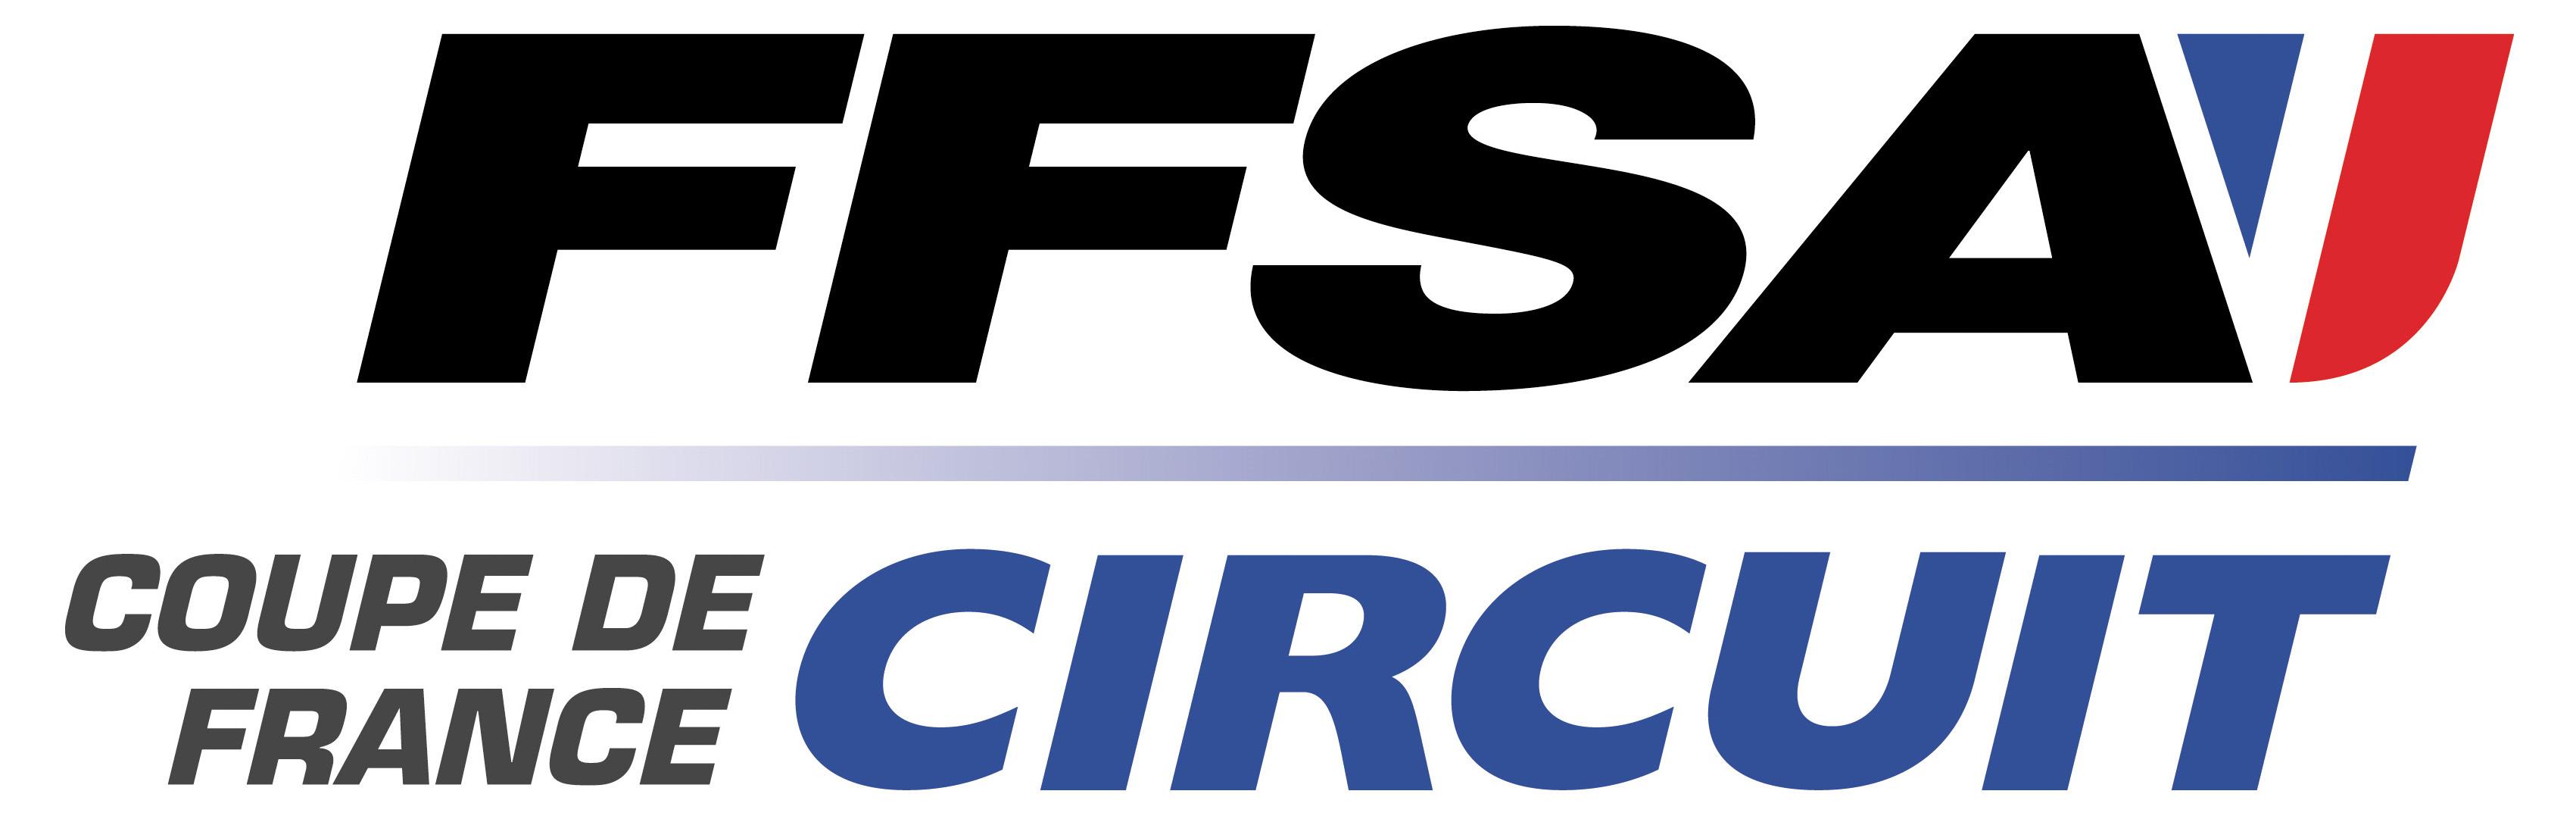 CDF-CIRCUIT-FFSA